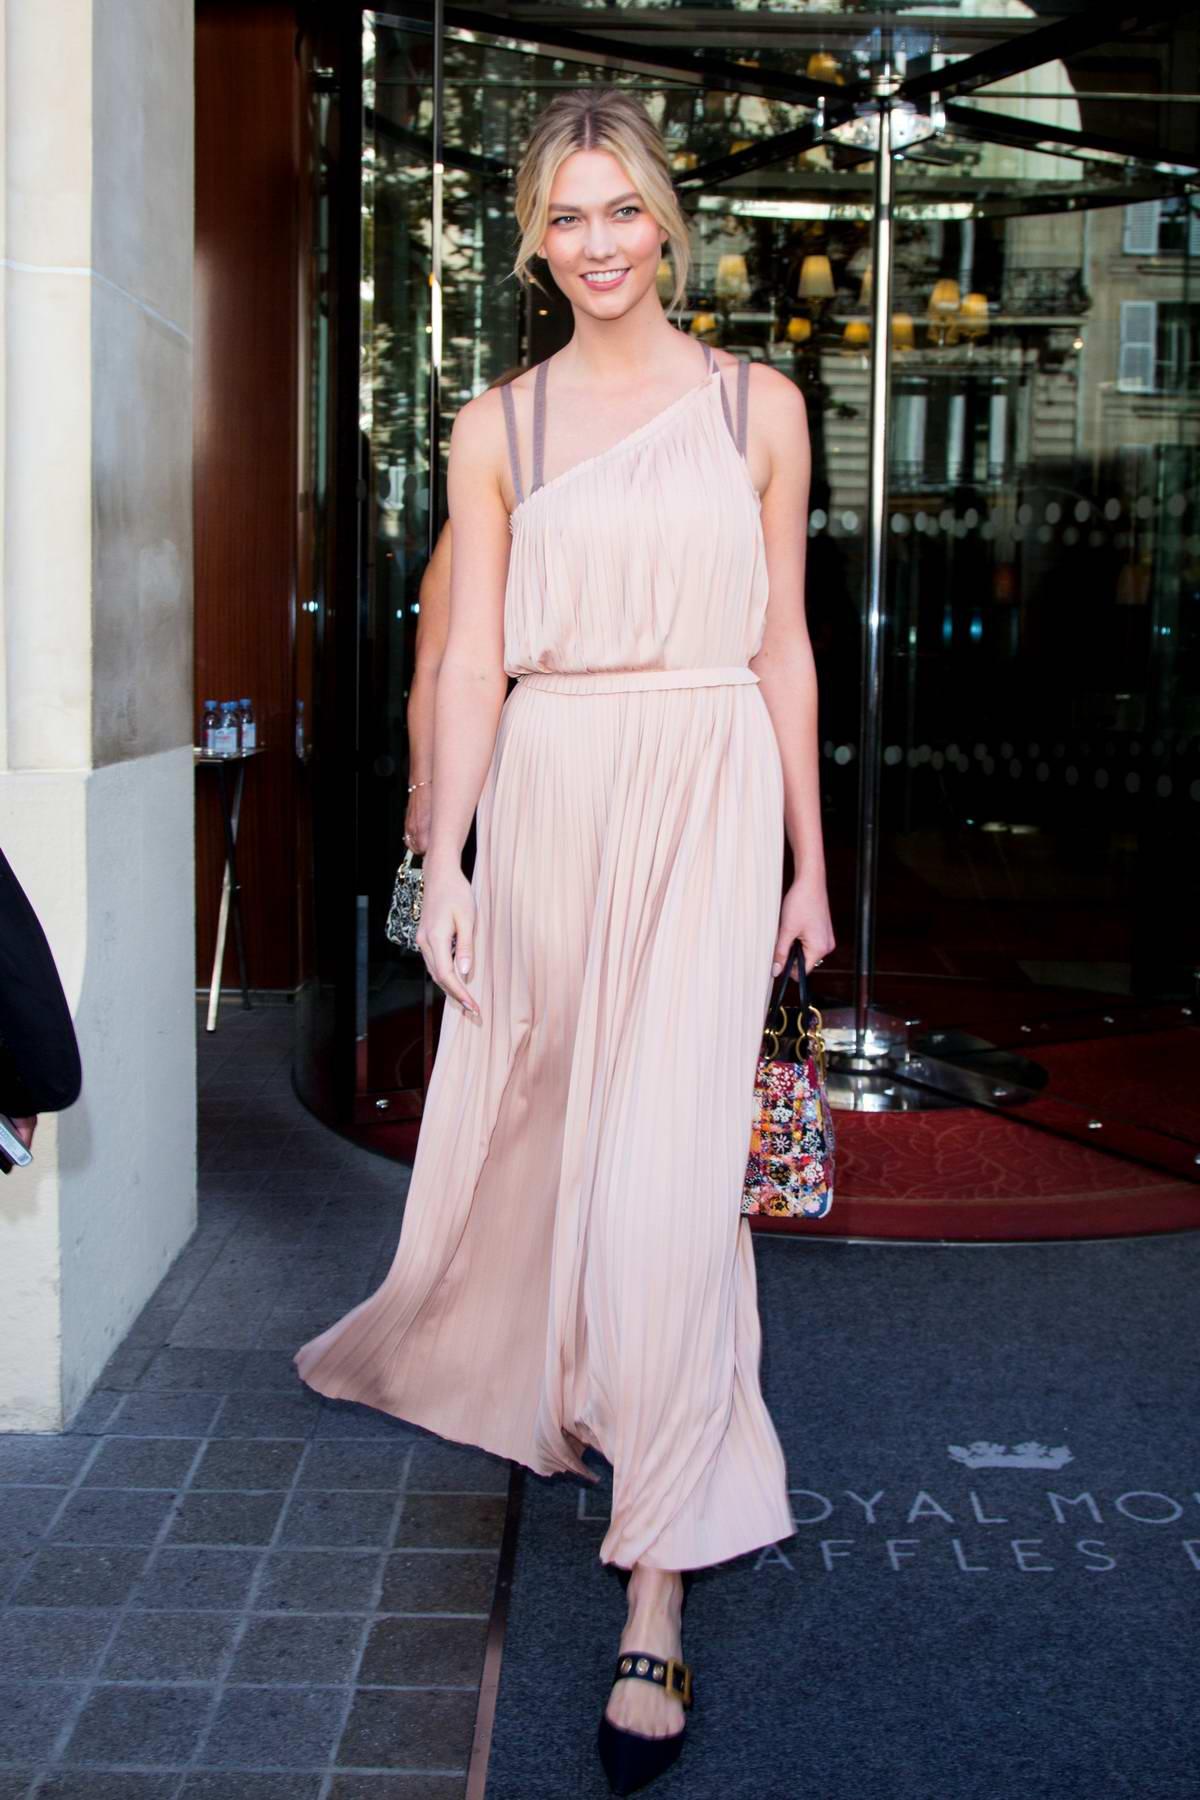 Karlie Kloss wears a light peach dress as she leaves the Royal Monceau Hotel during Paris Fashion Week in Paris, France